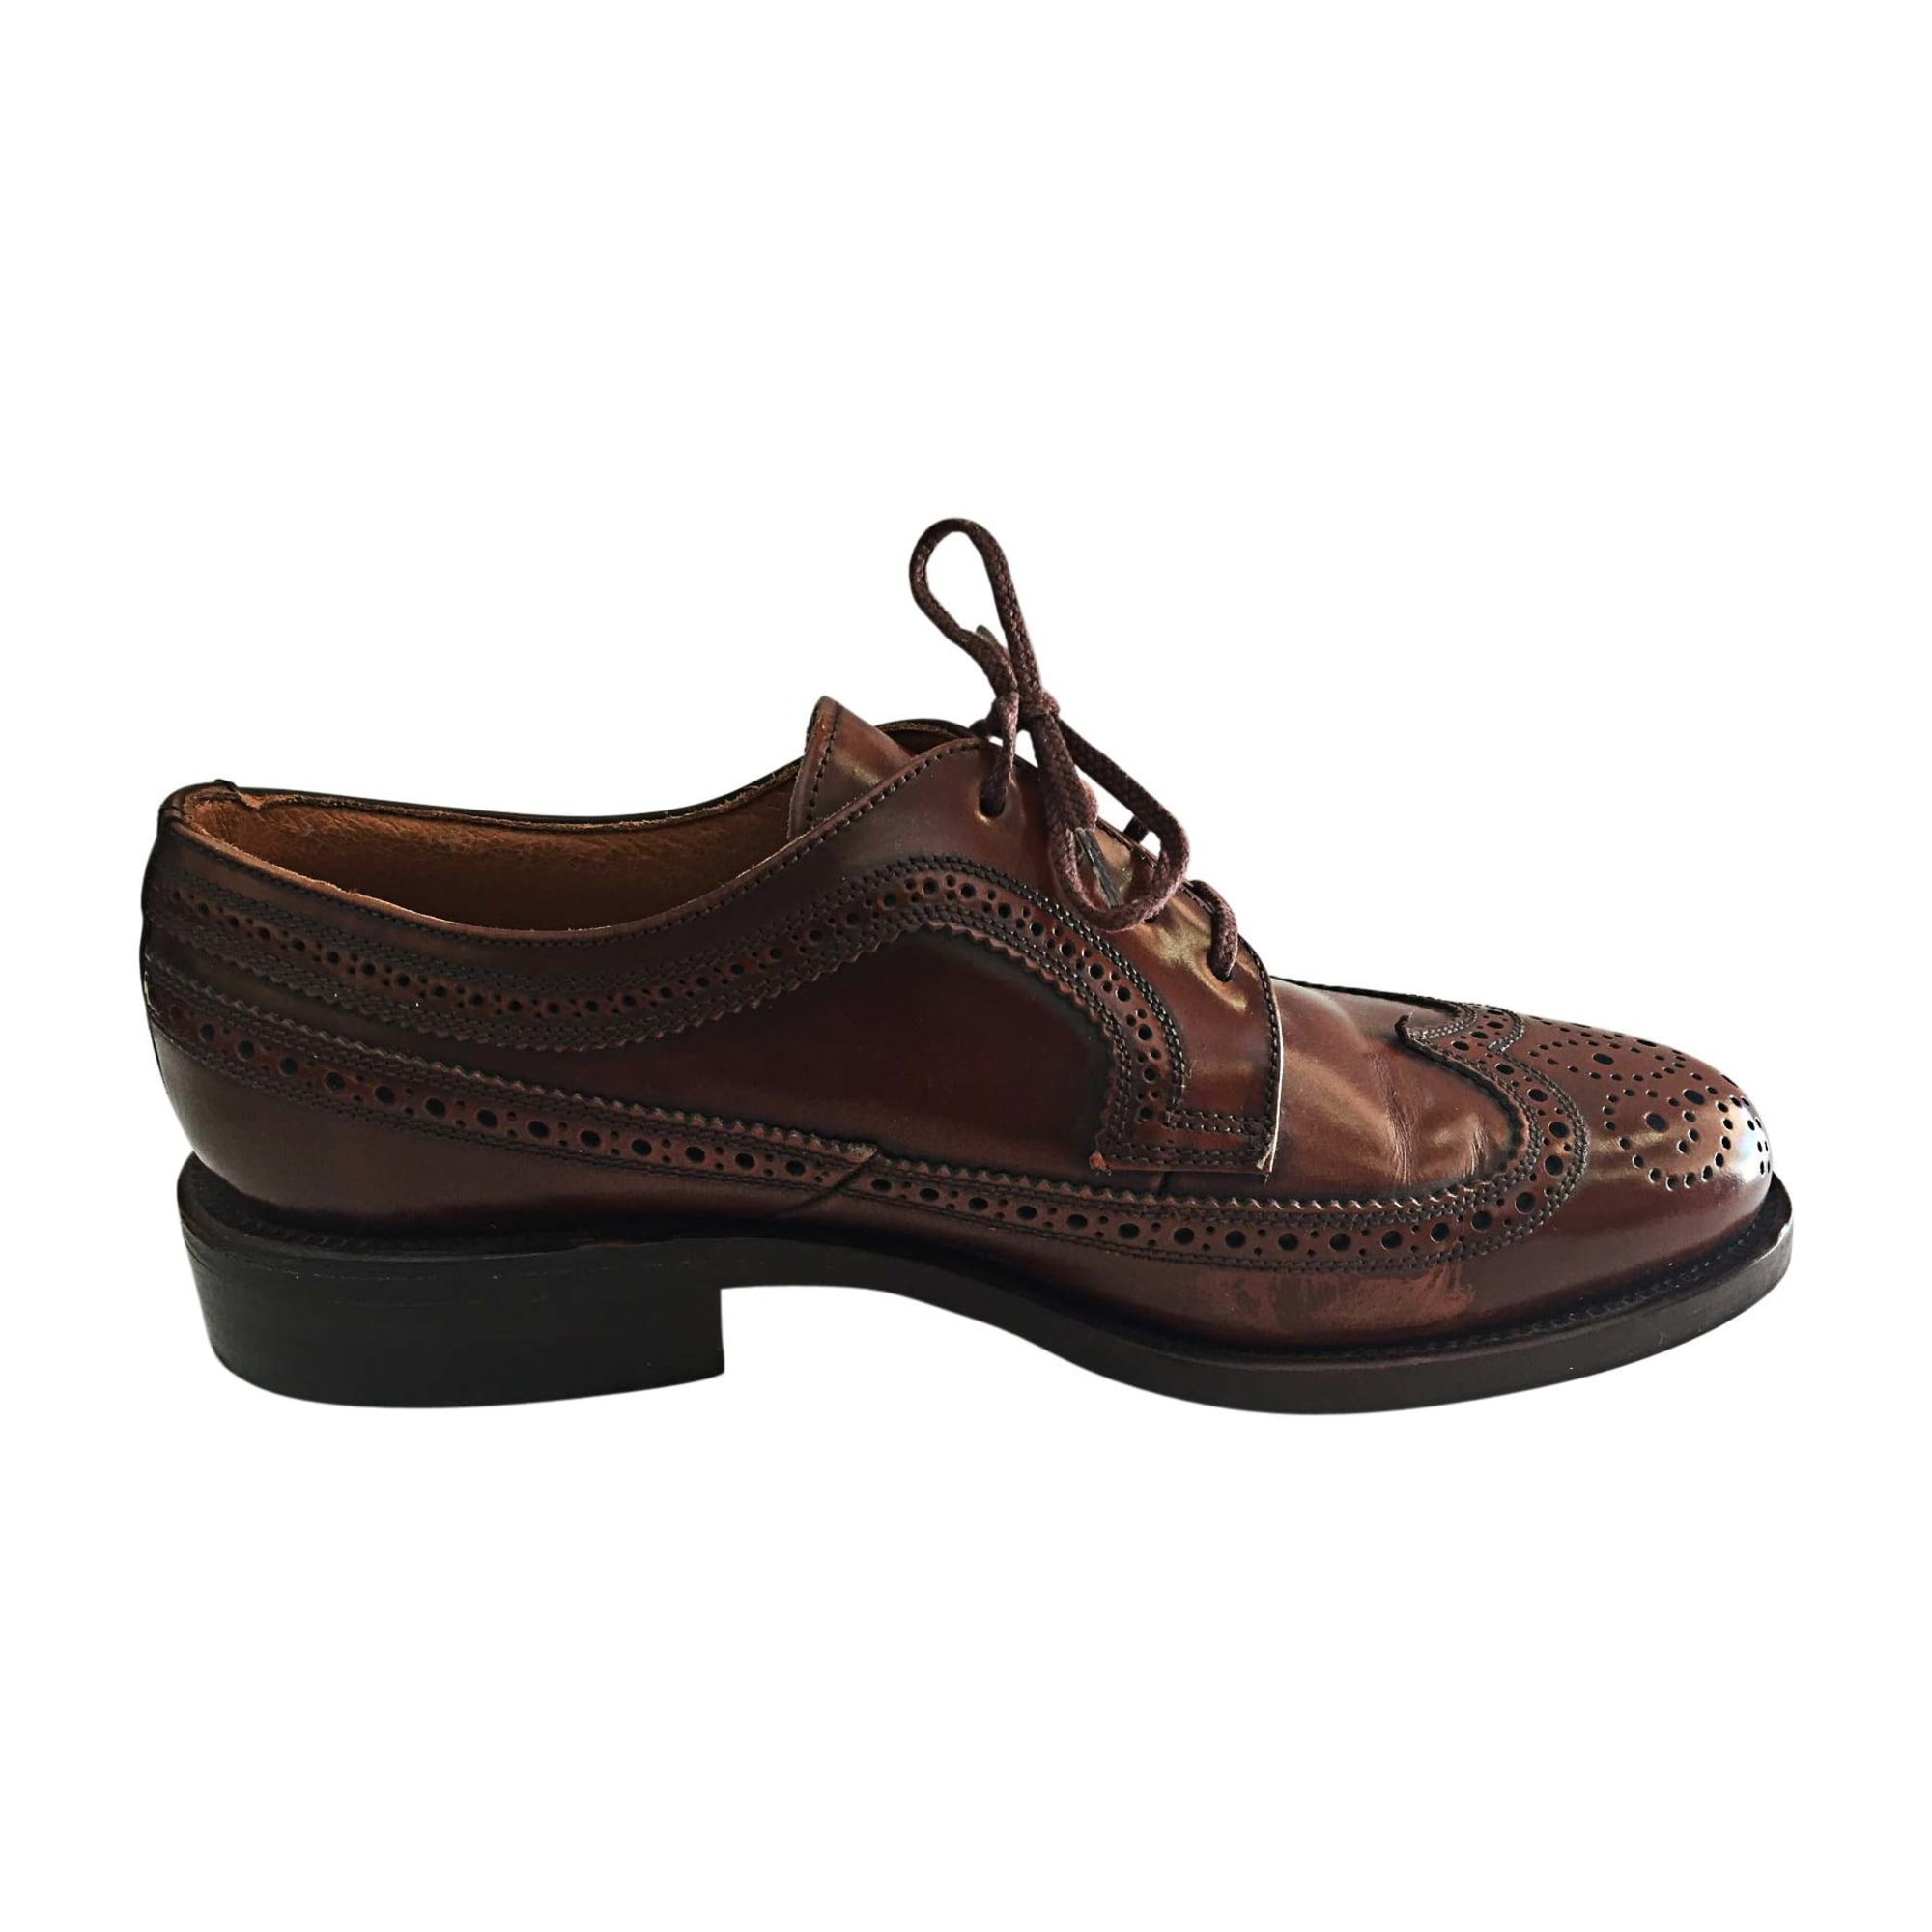 Chaussures à lacets BALLY Marron